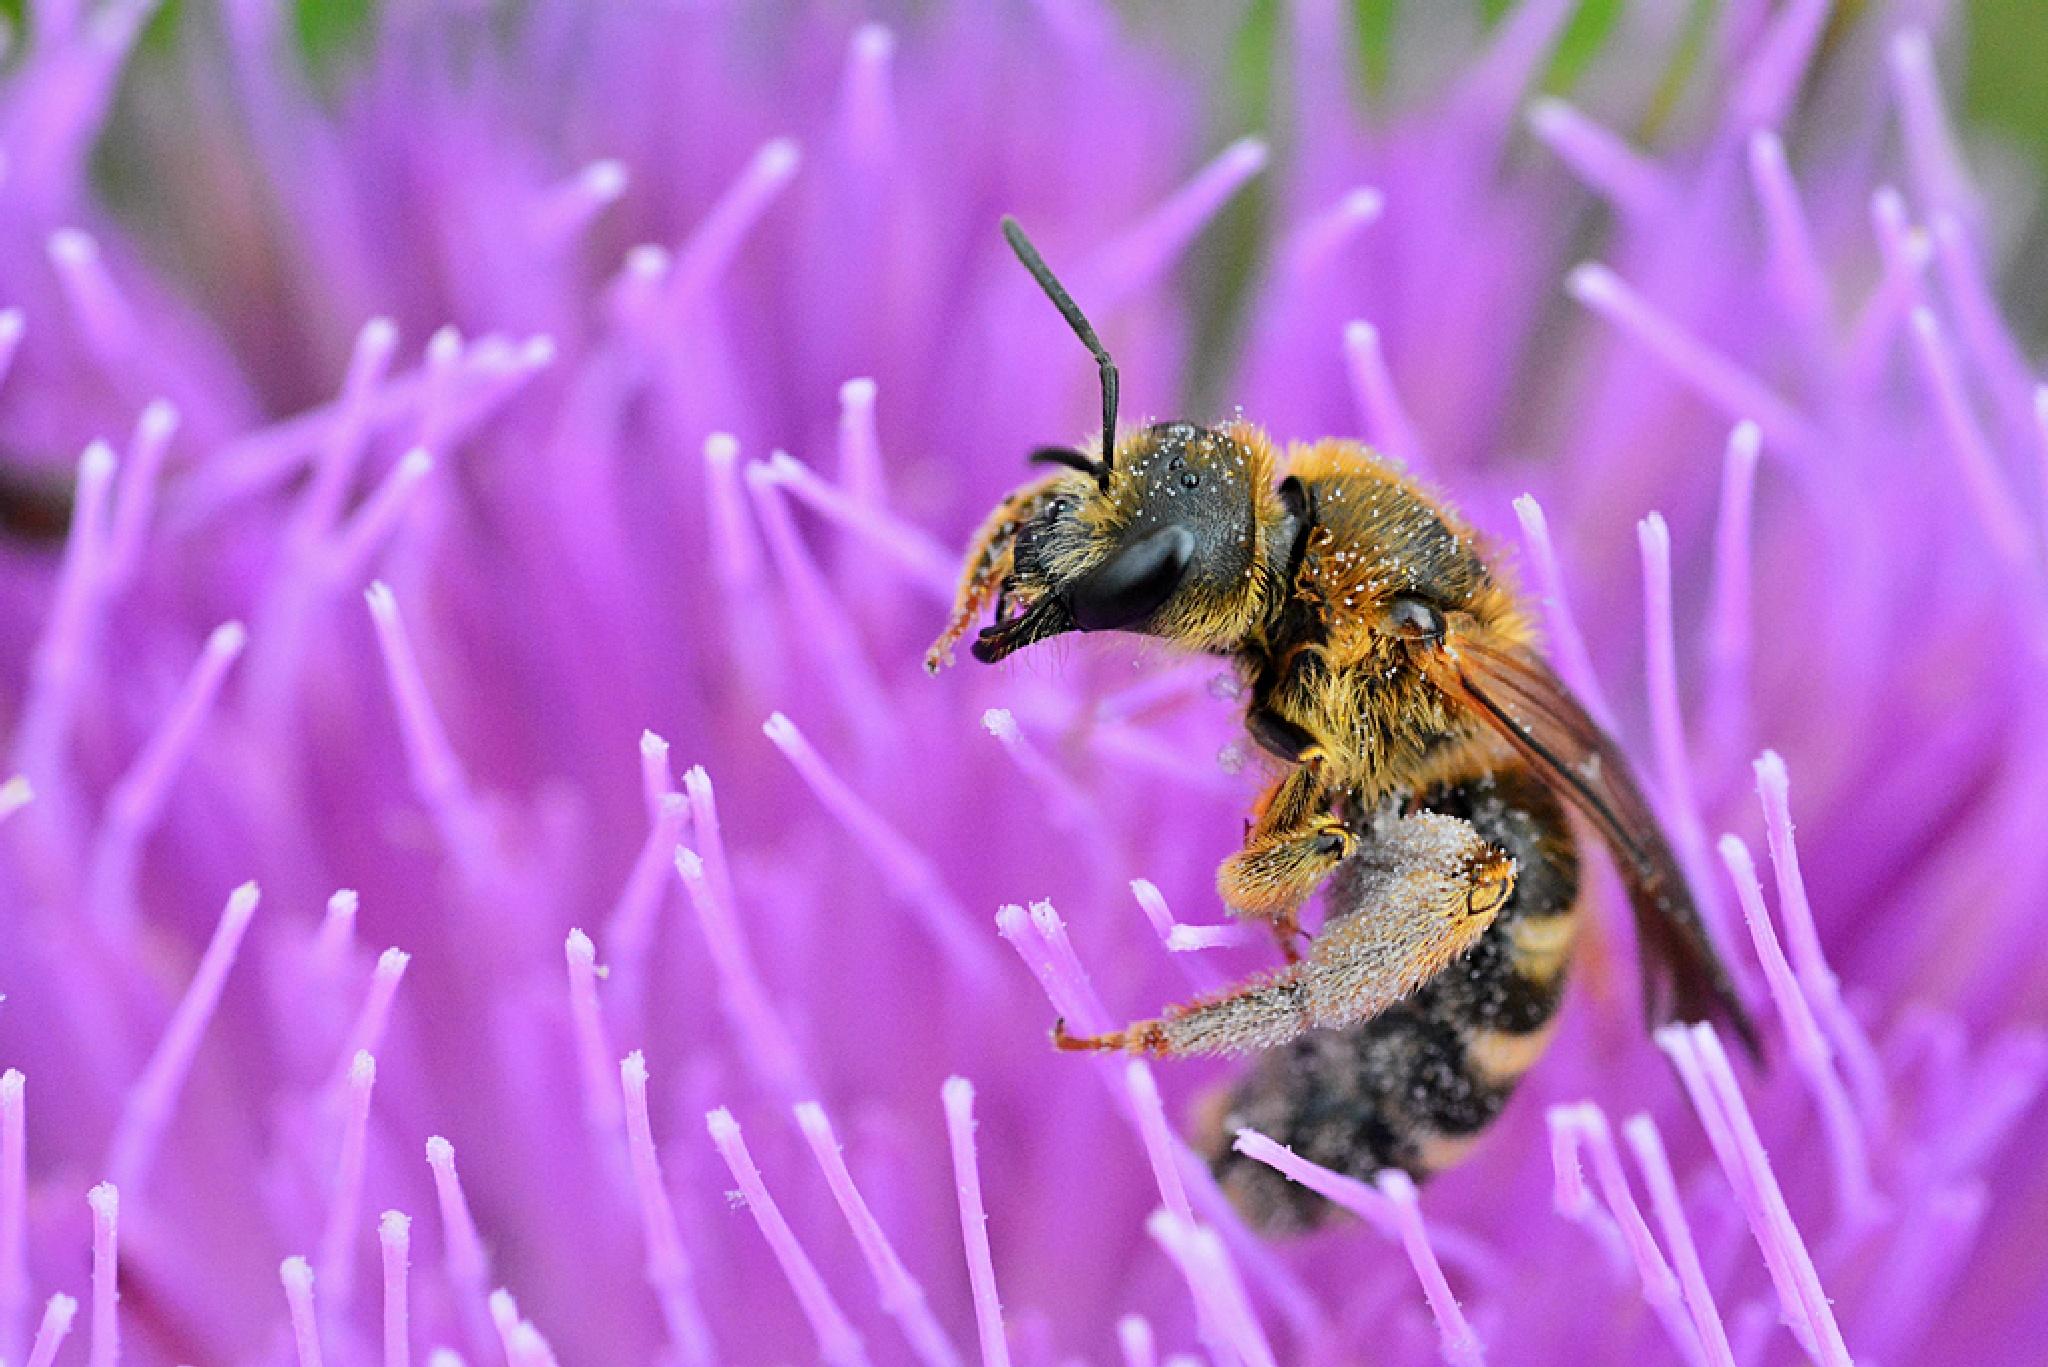 Bee on the milk thistle by Ümit Alper TÜMEN